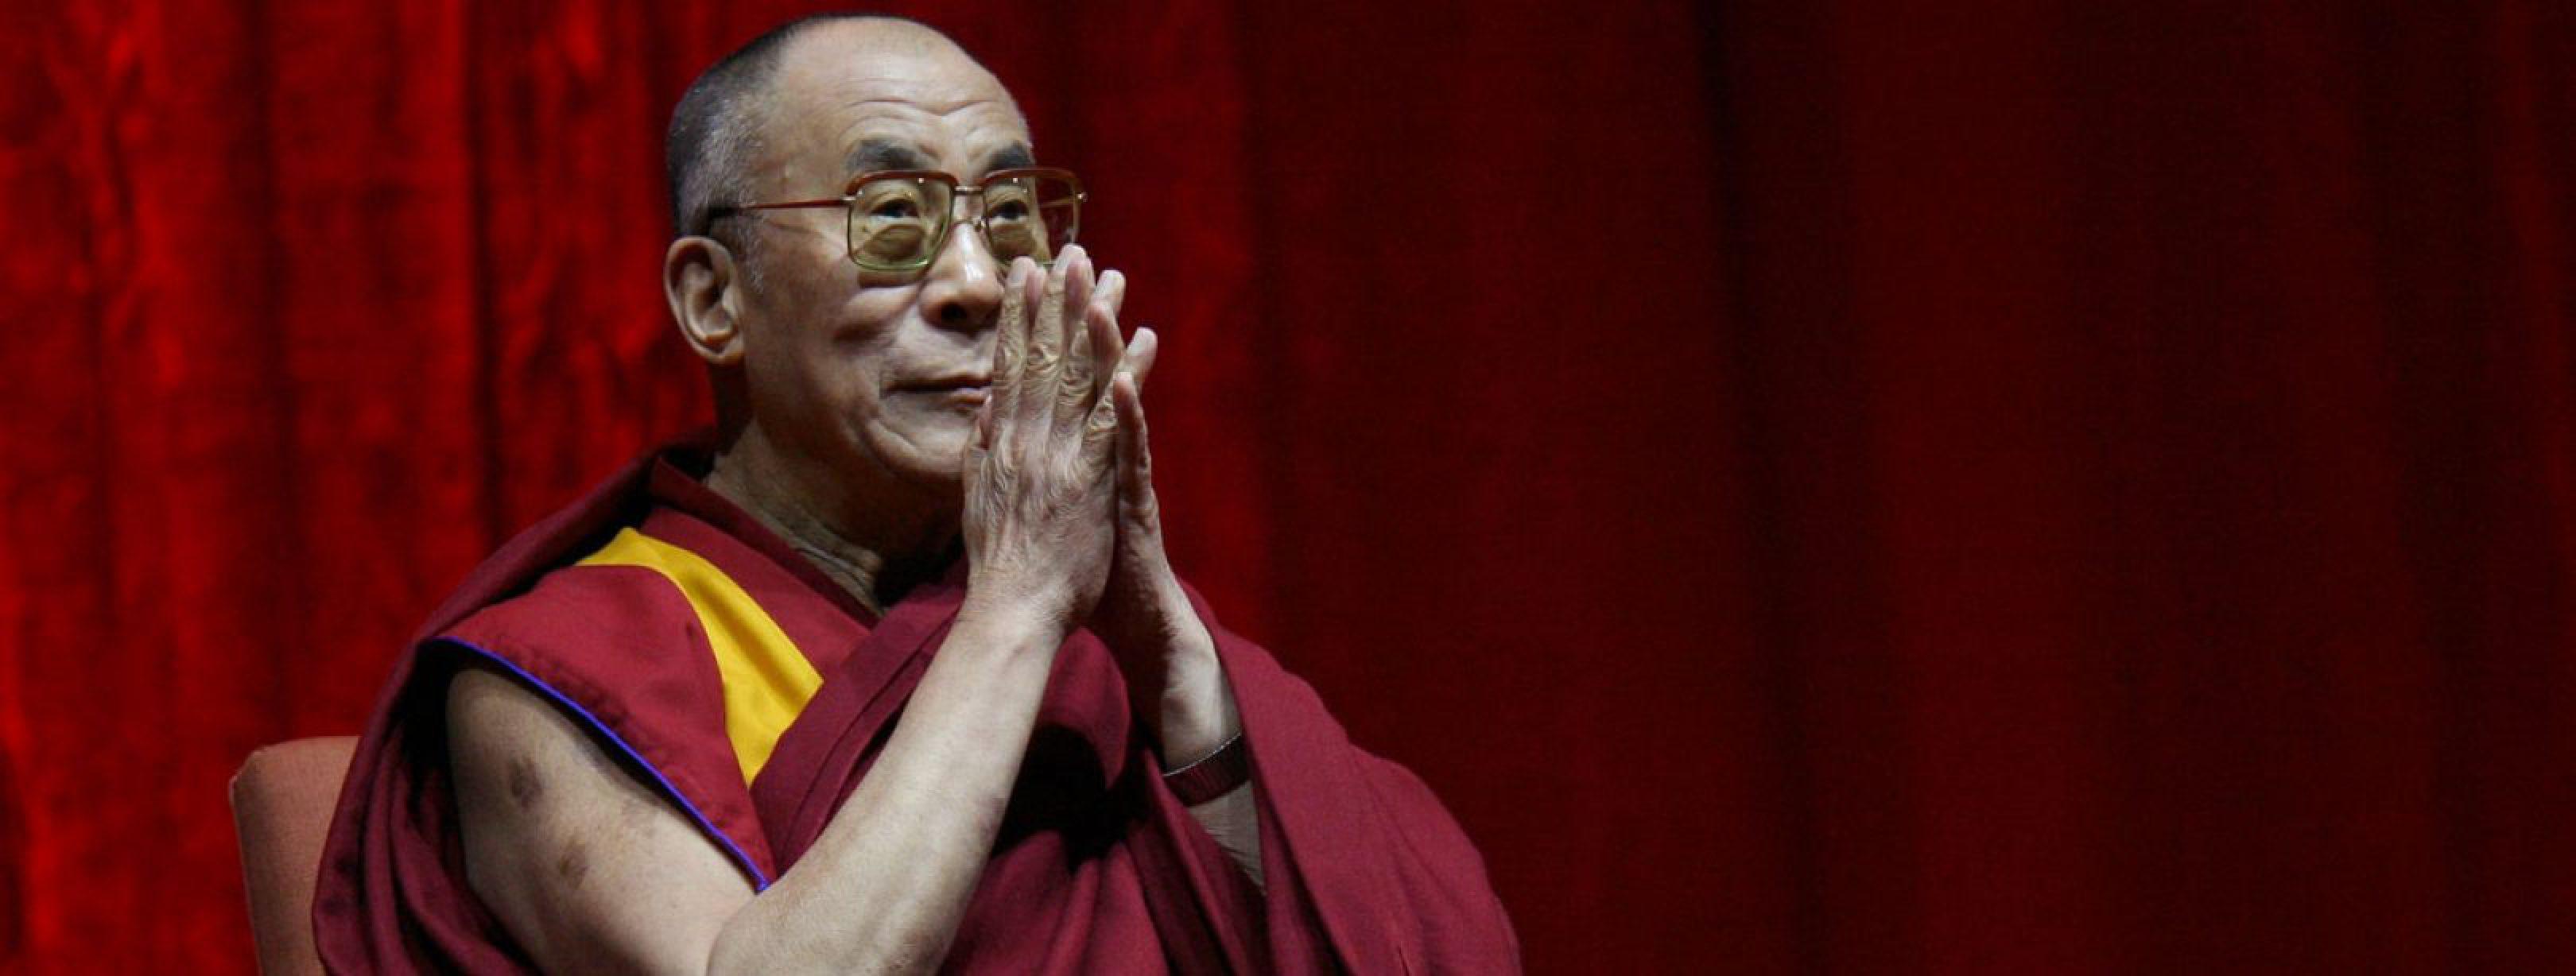 dalai lama on china